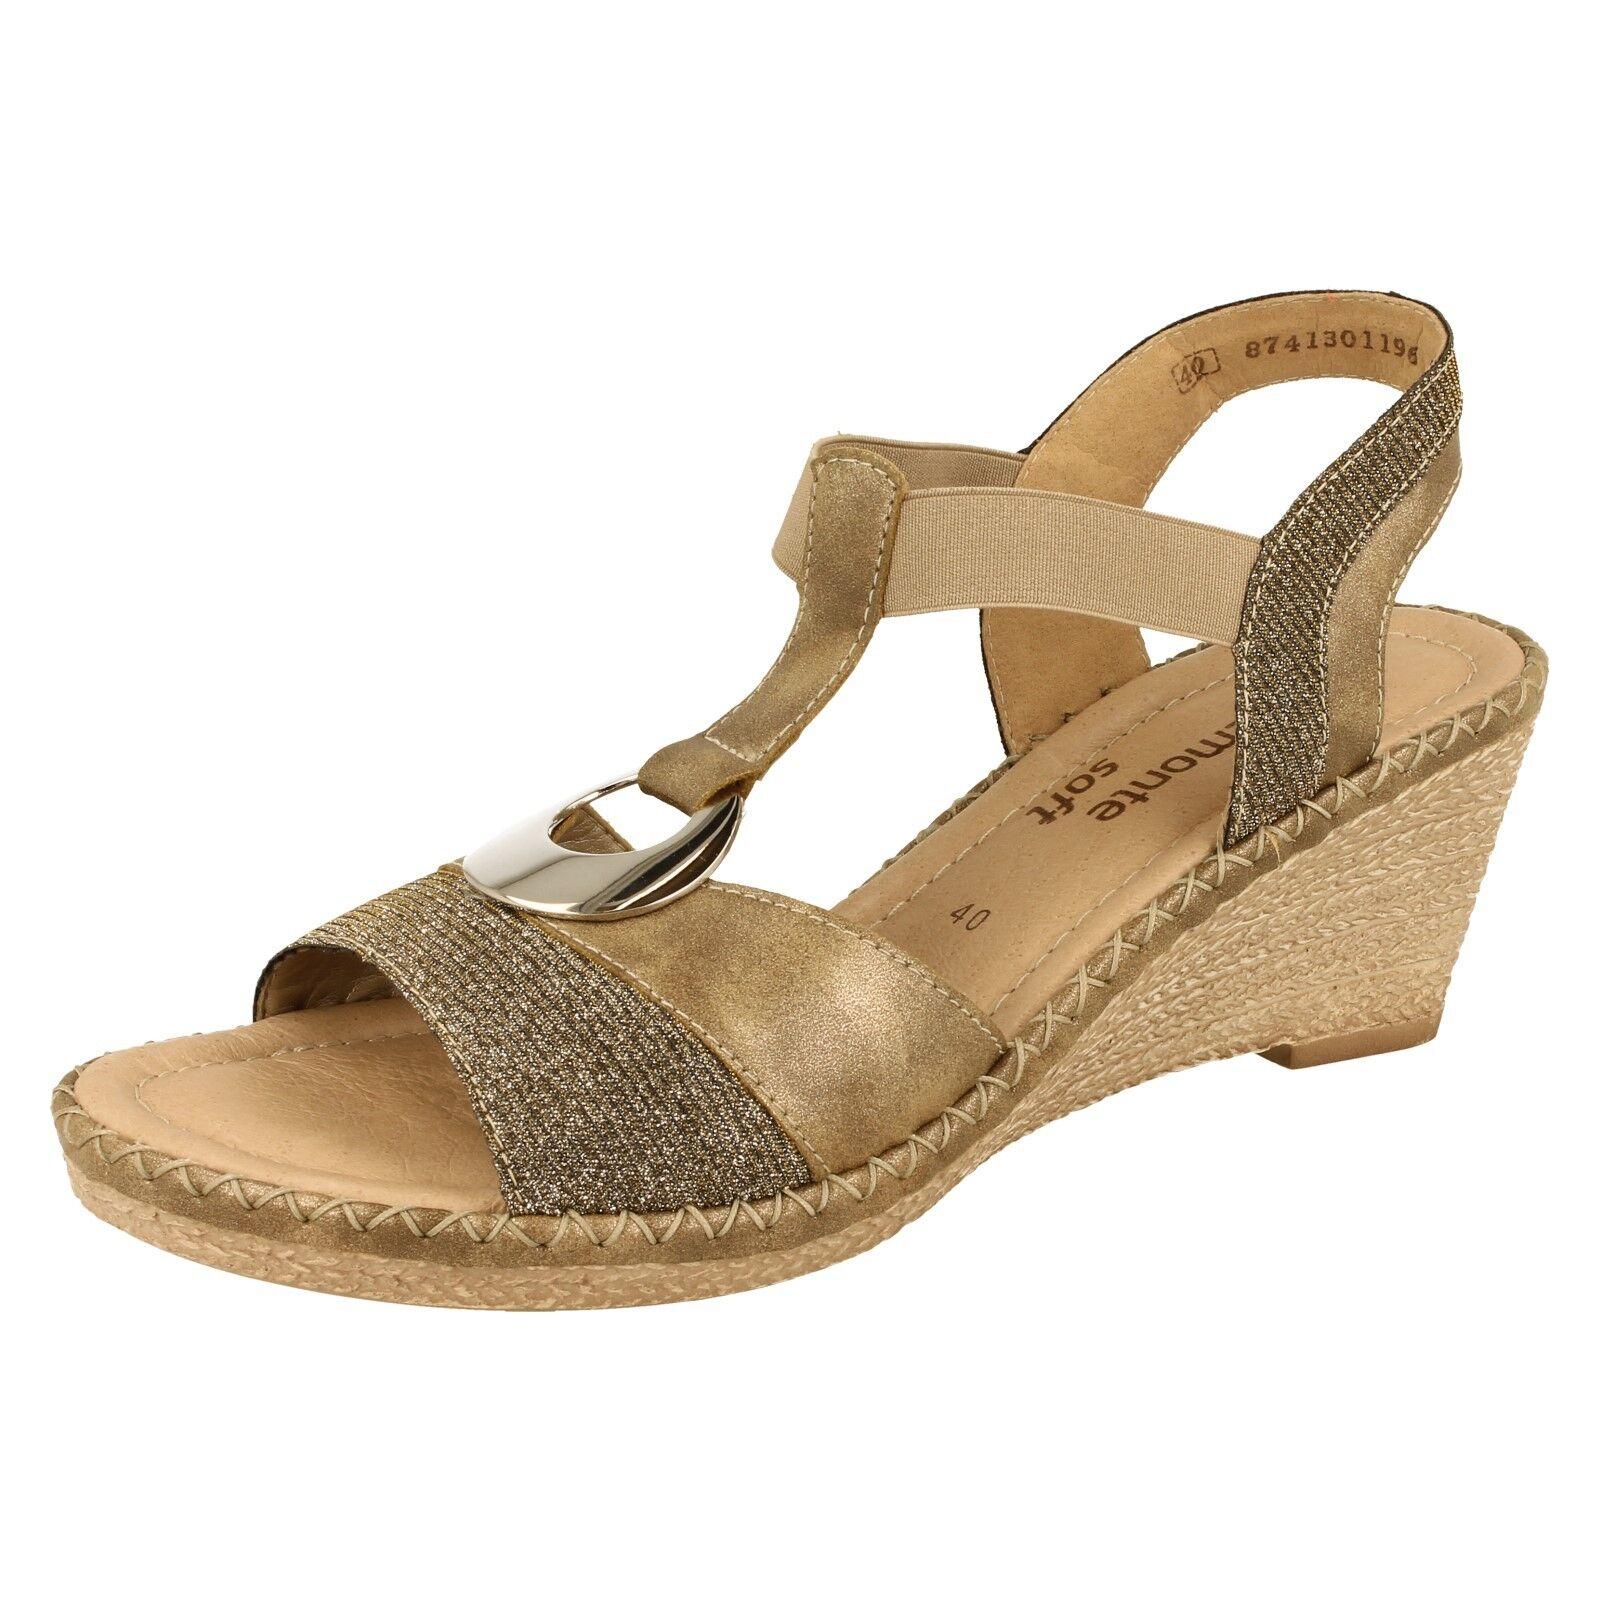 Ladies Remonte Sandals - D6762